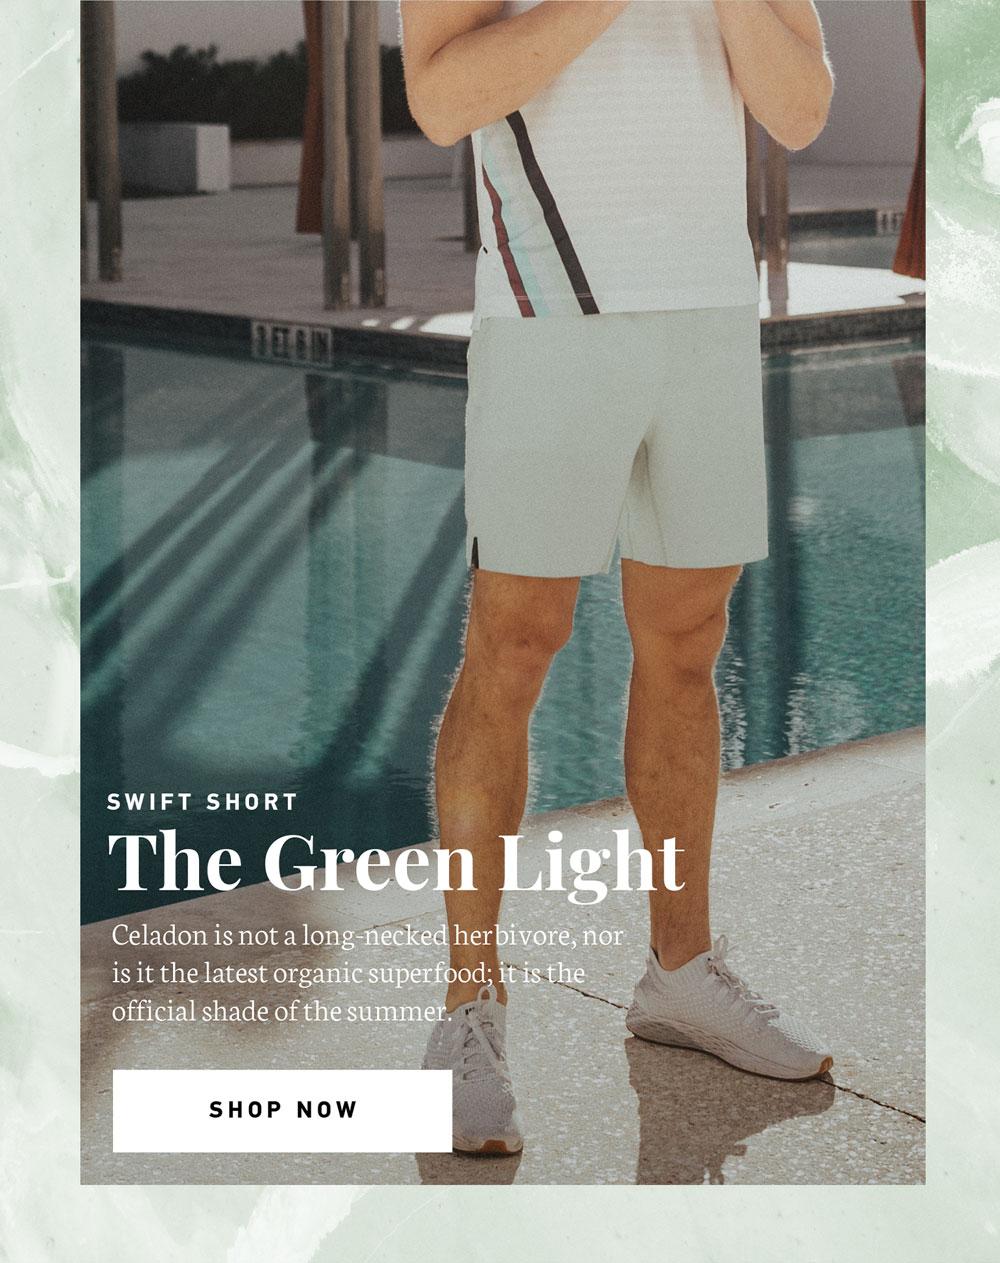 The Green Light